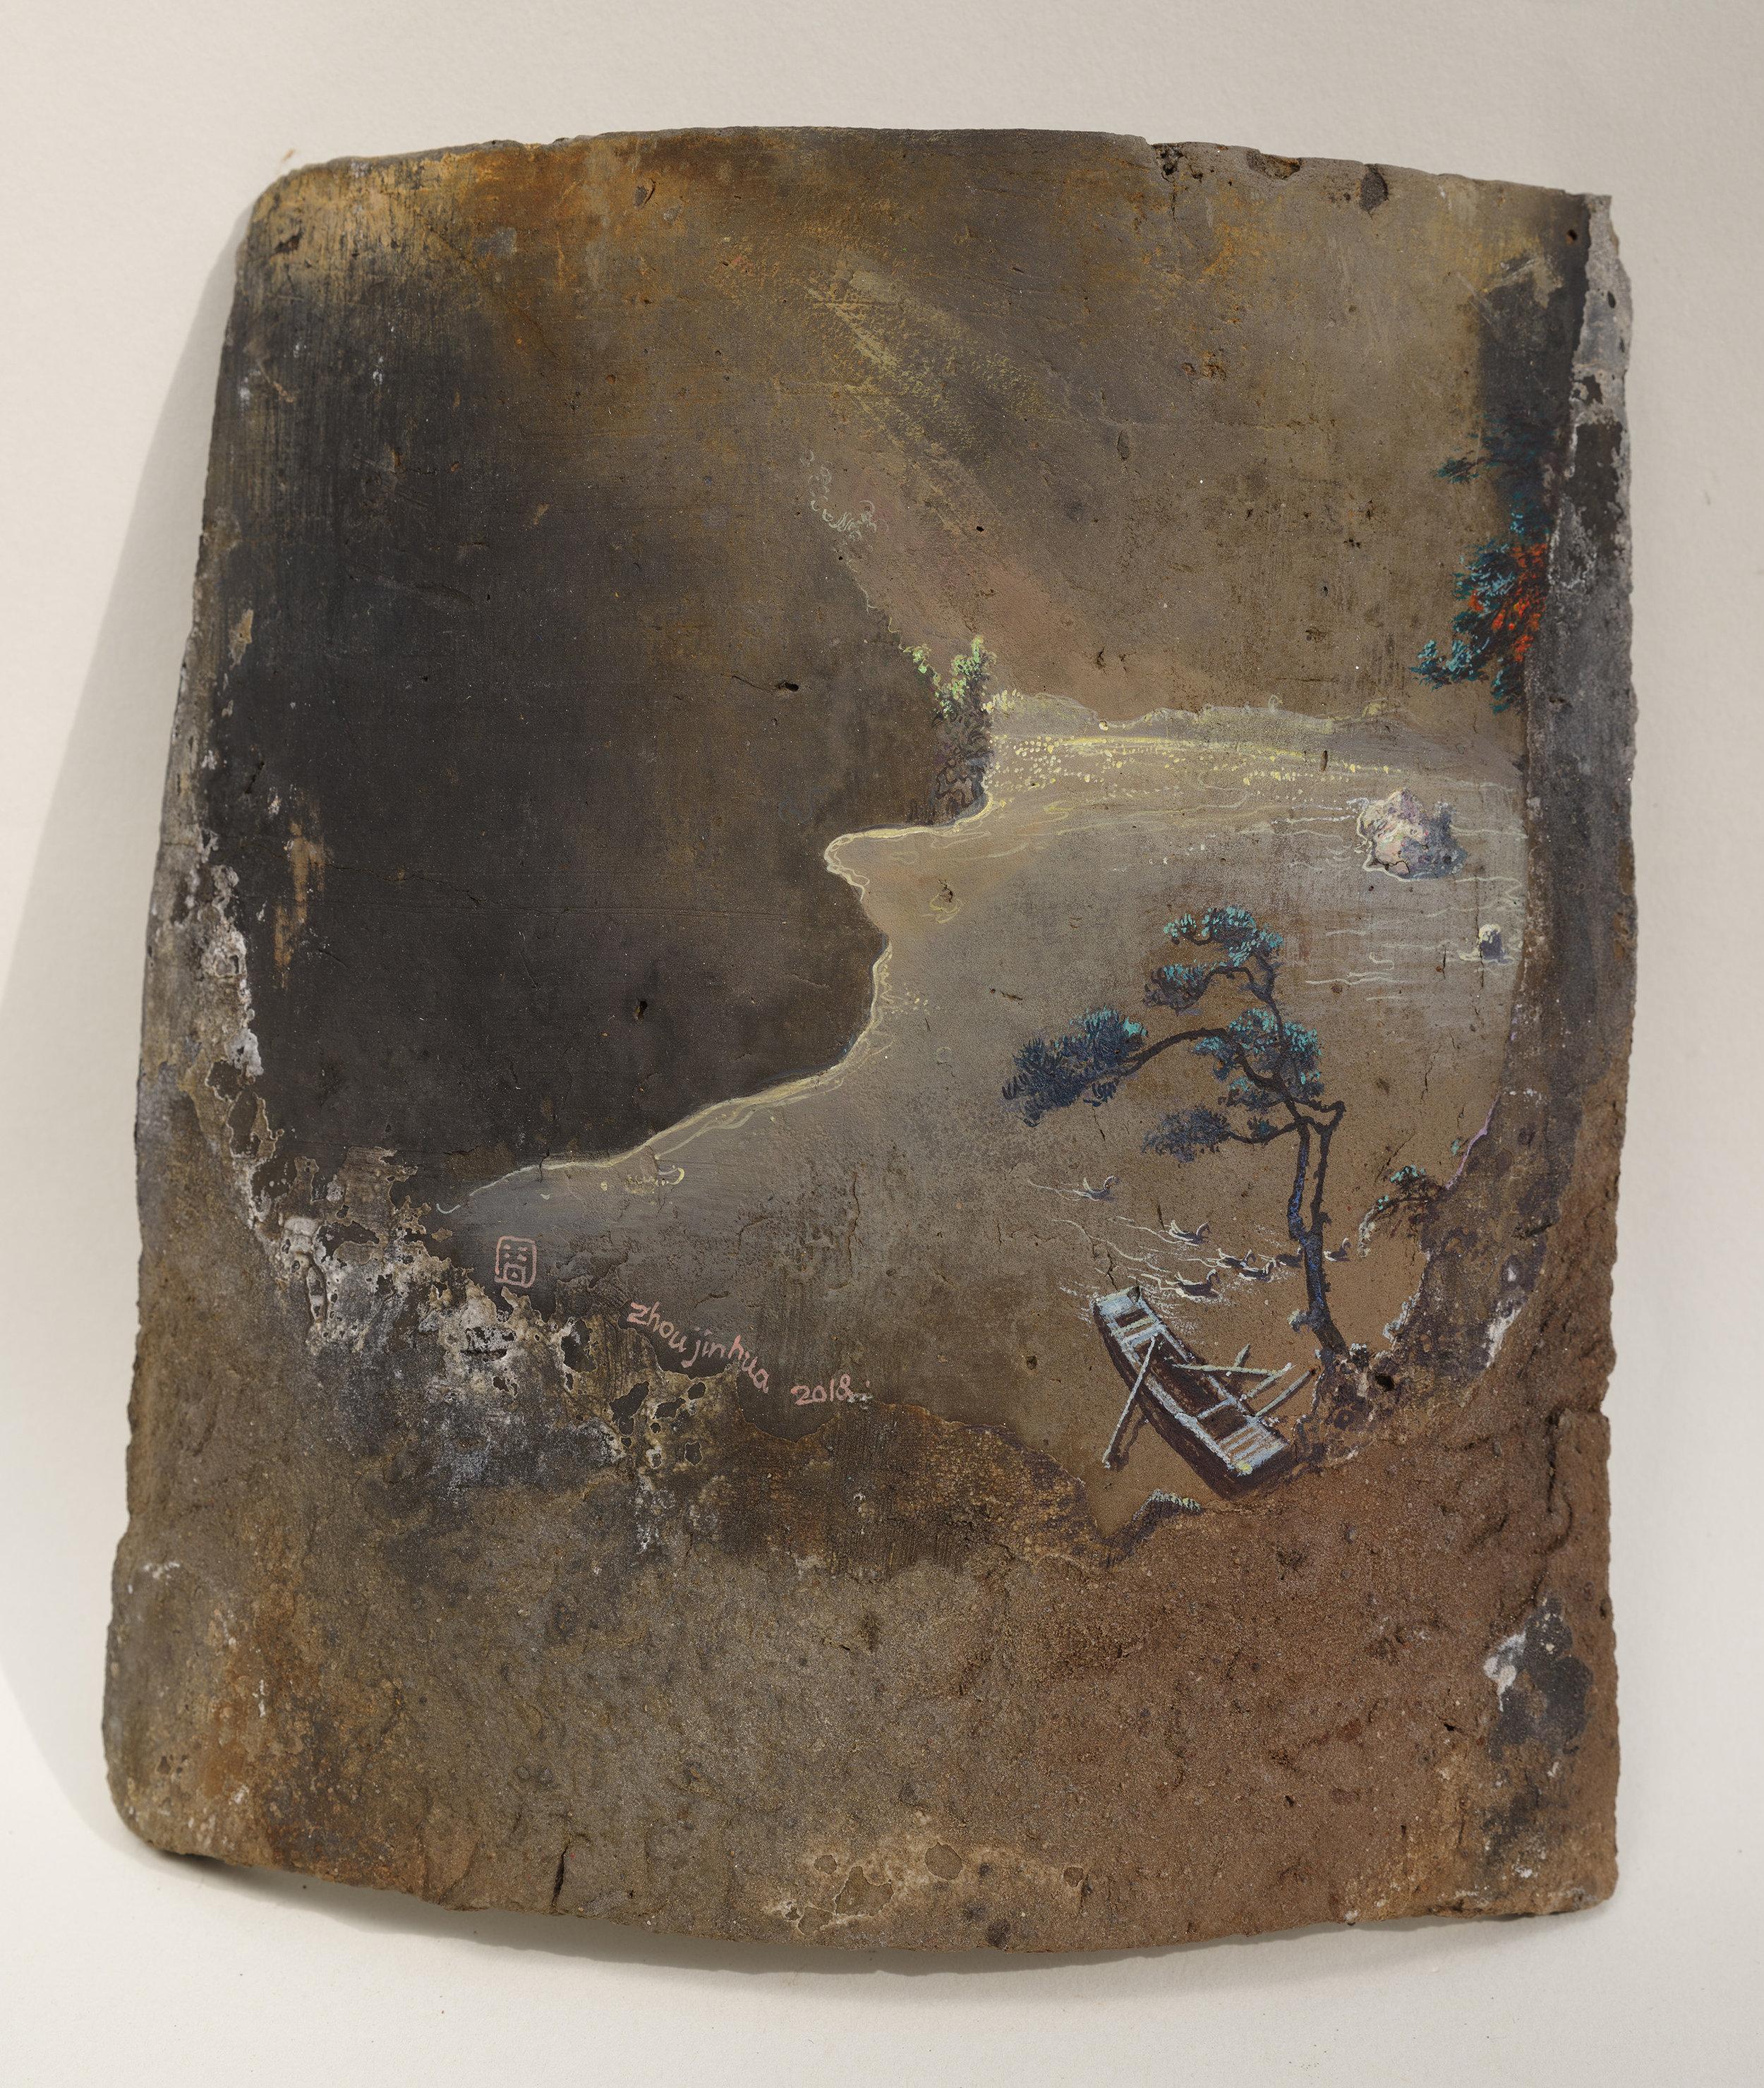 Zhou Jinhua 周金华, Remains of the Day 你我的痕迹 No.14, 2018, Acrylic on roof tile 瓦片、丙烯颜料, 21 x 19 cm